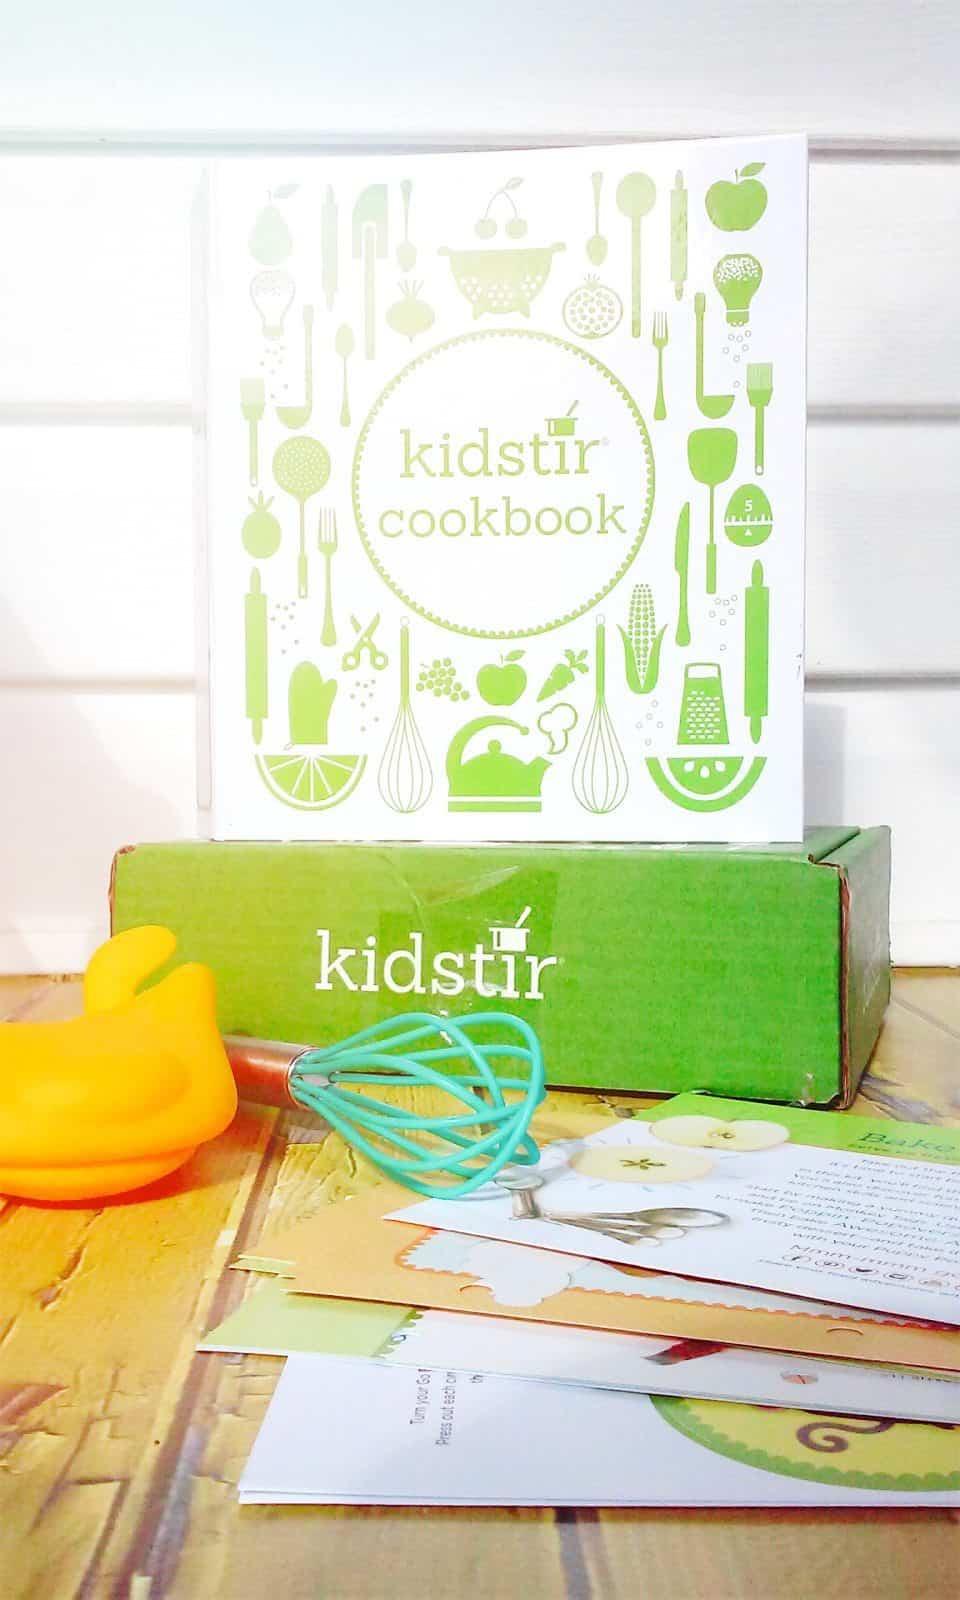 September 2016 Kidstir Box Review - Cookbook